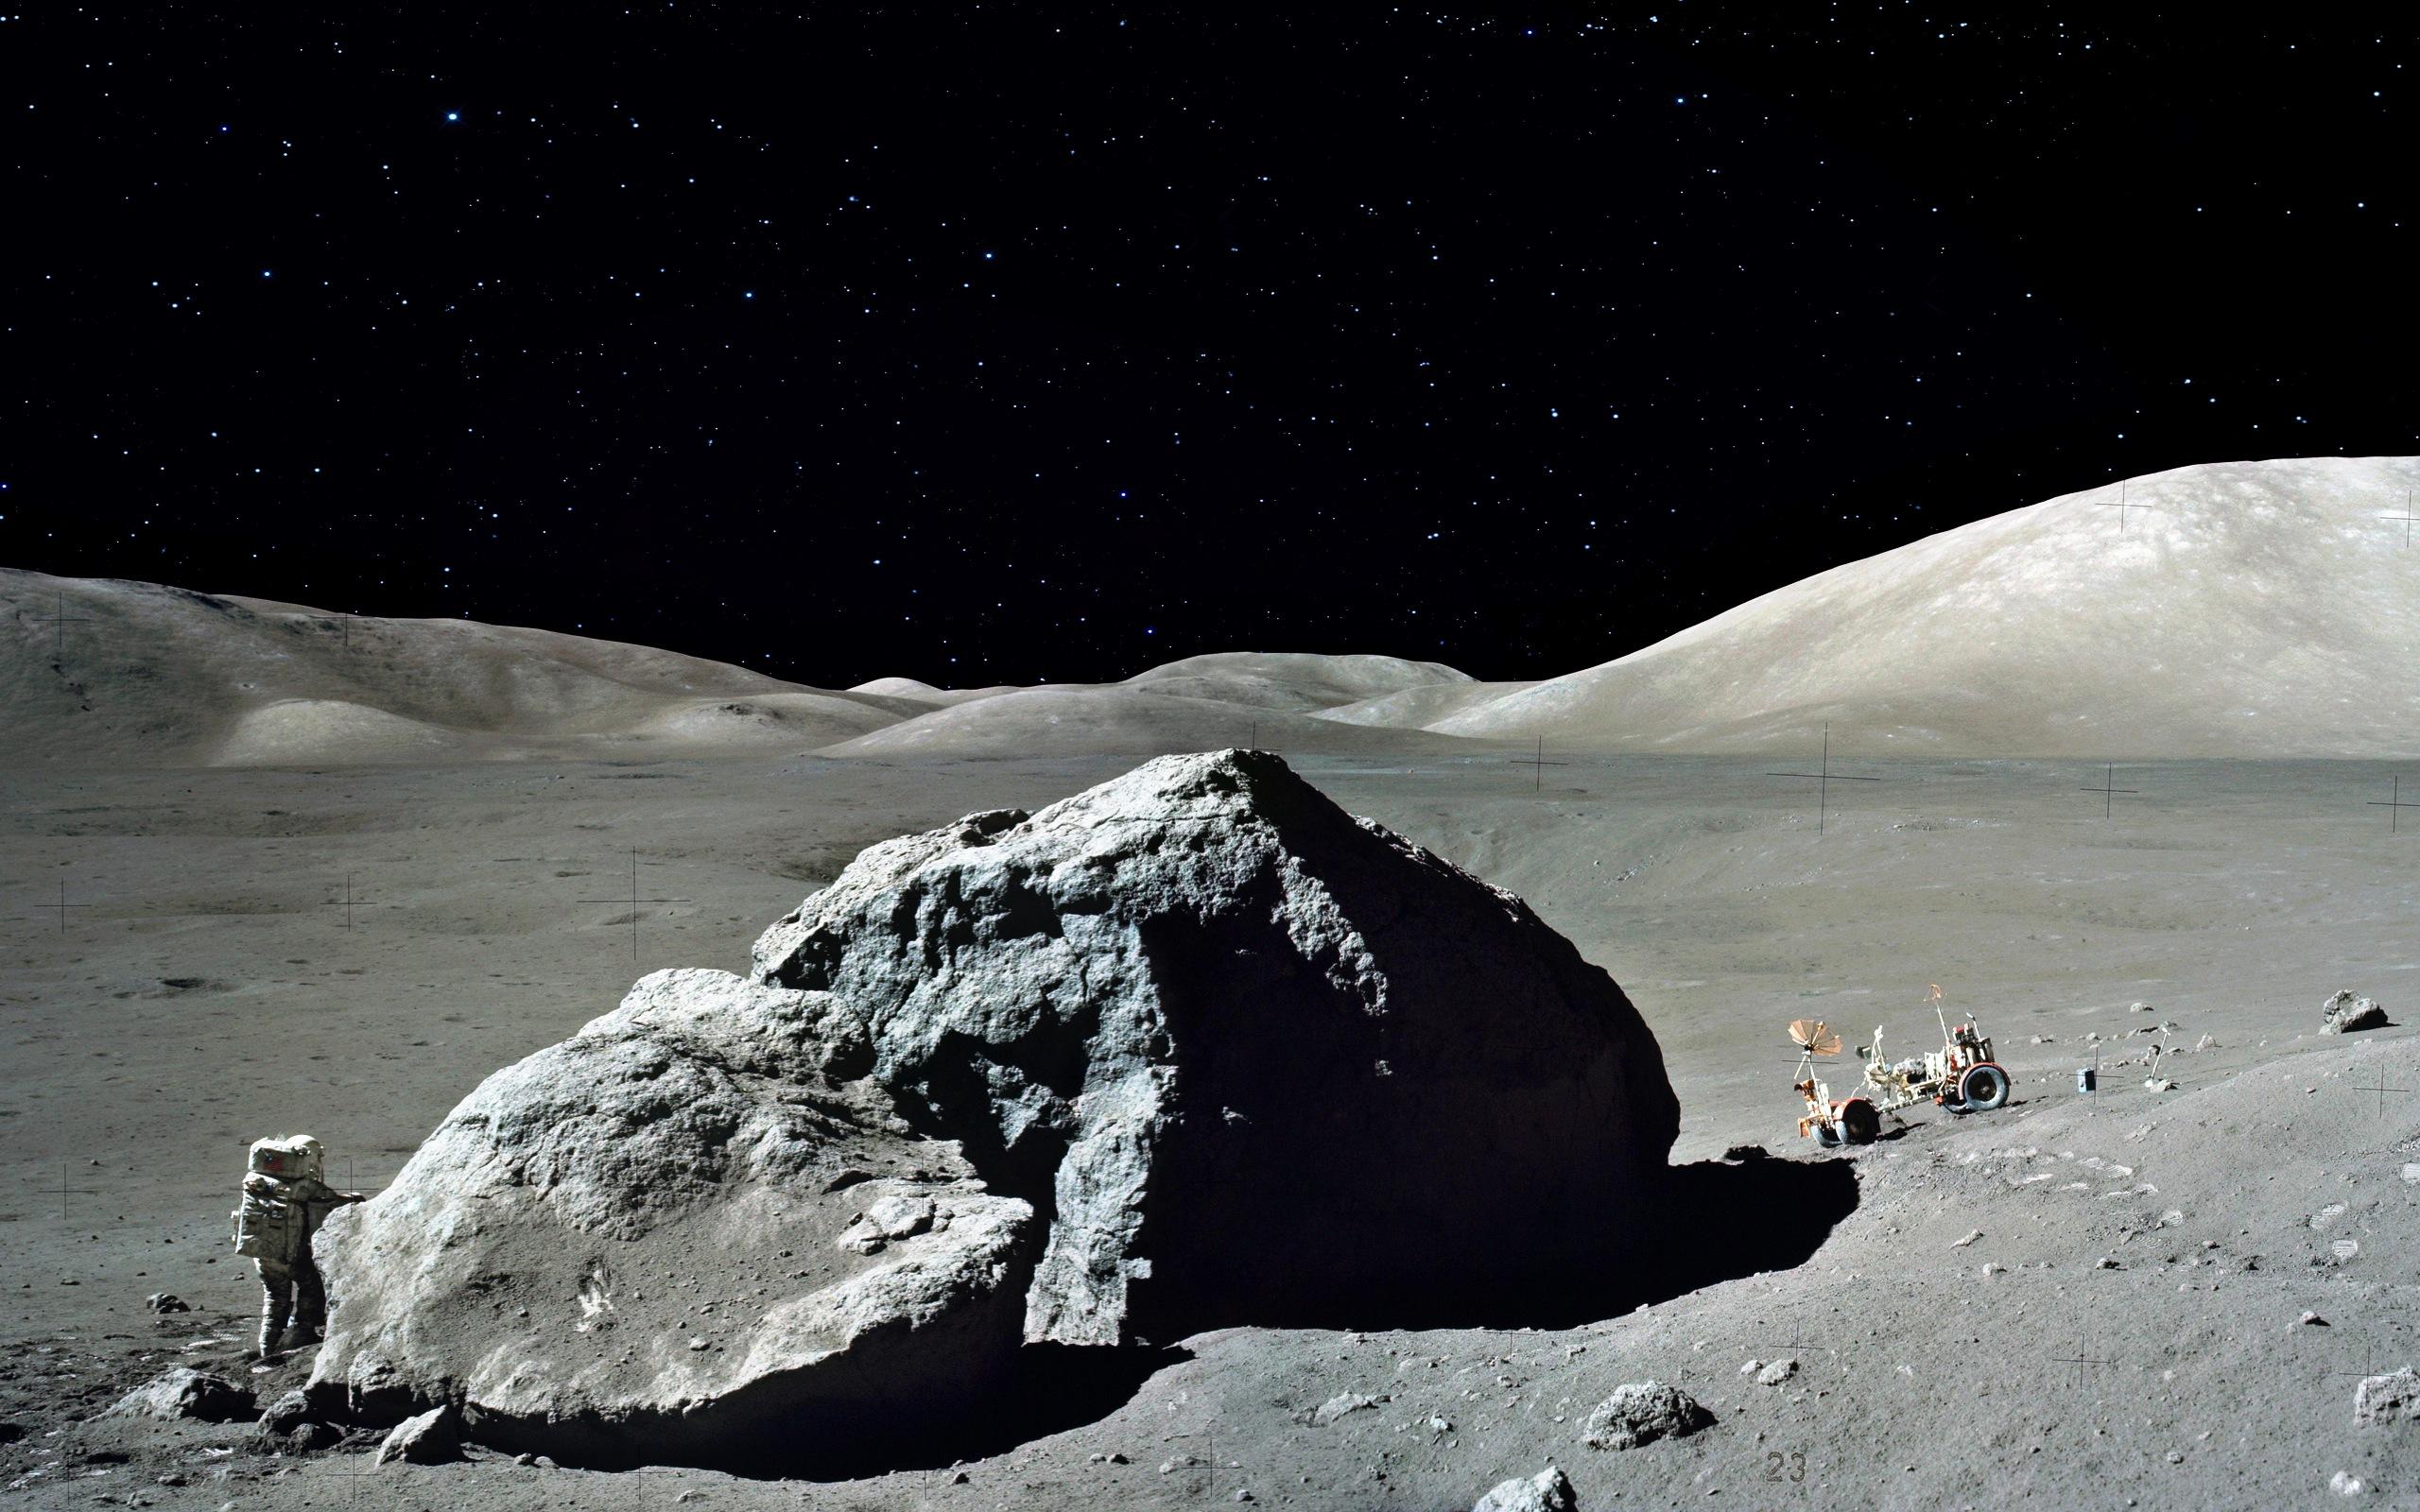 Apollo 17 Wallpaper Apollo 17 Wallpaper 2560x1600